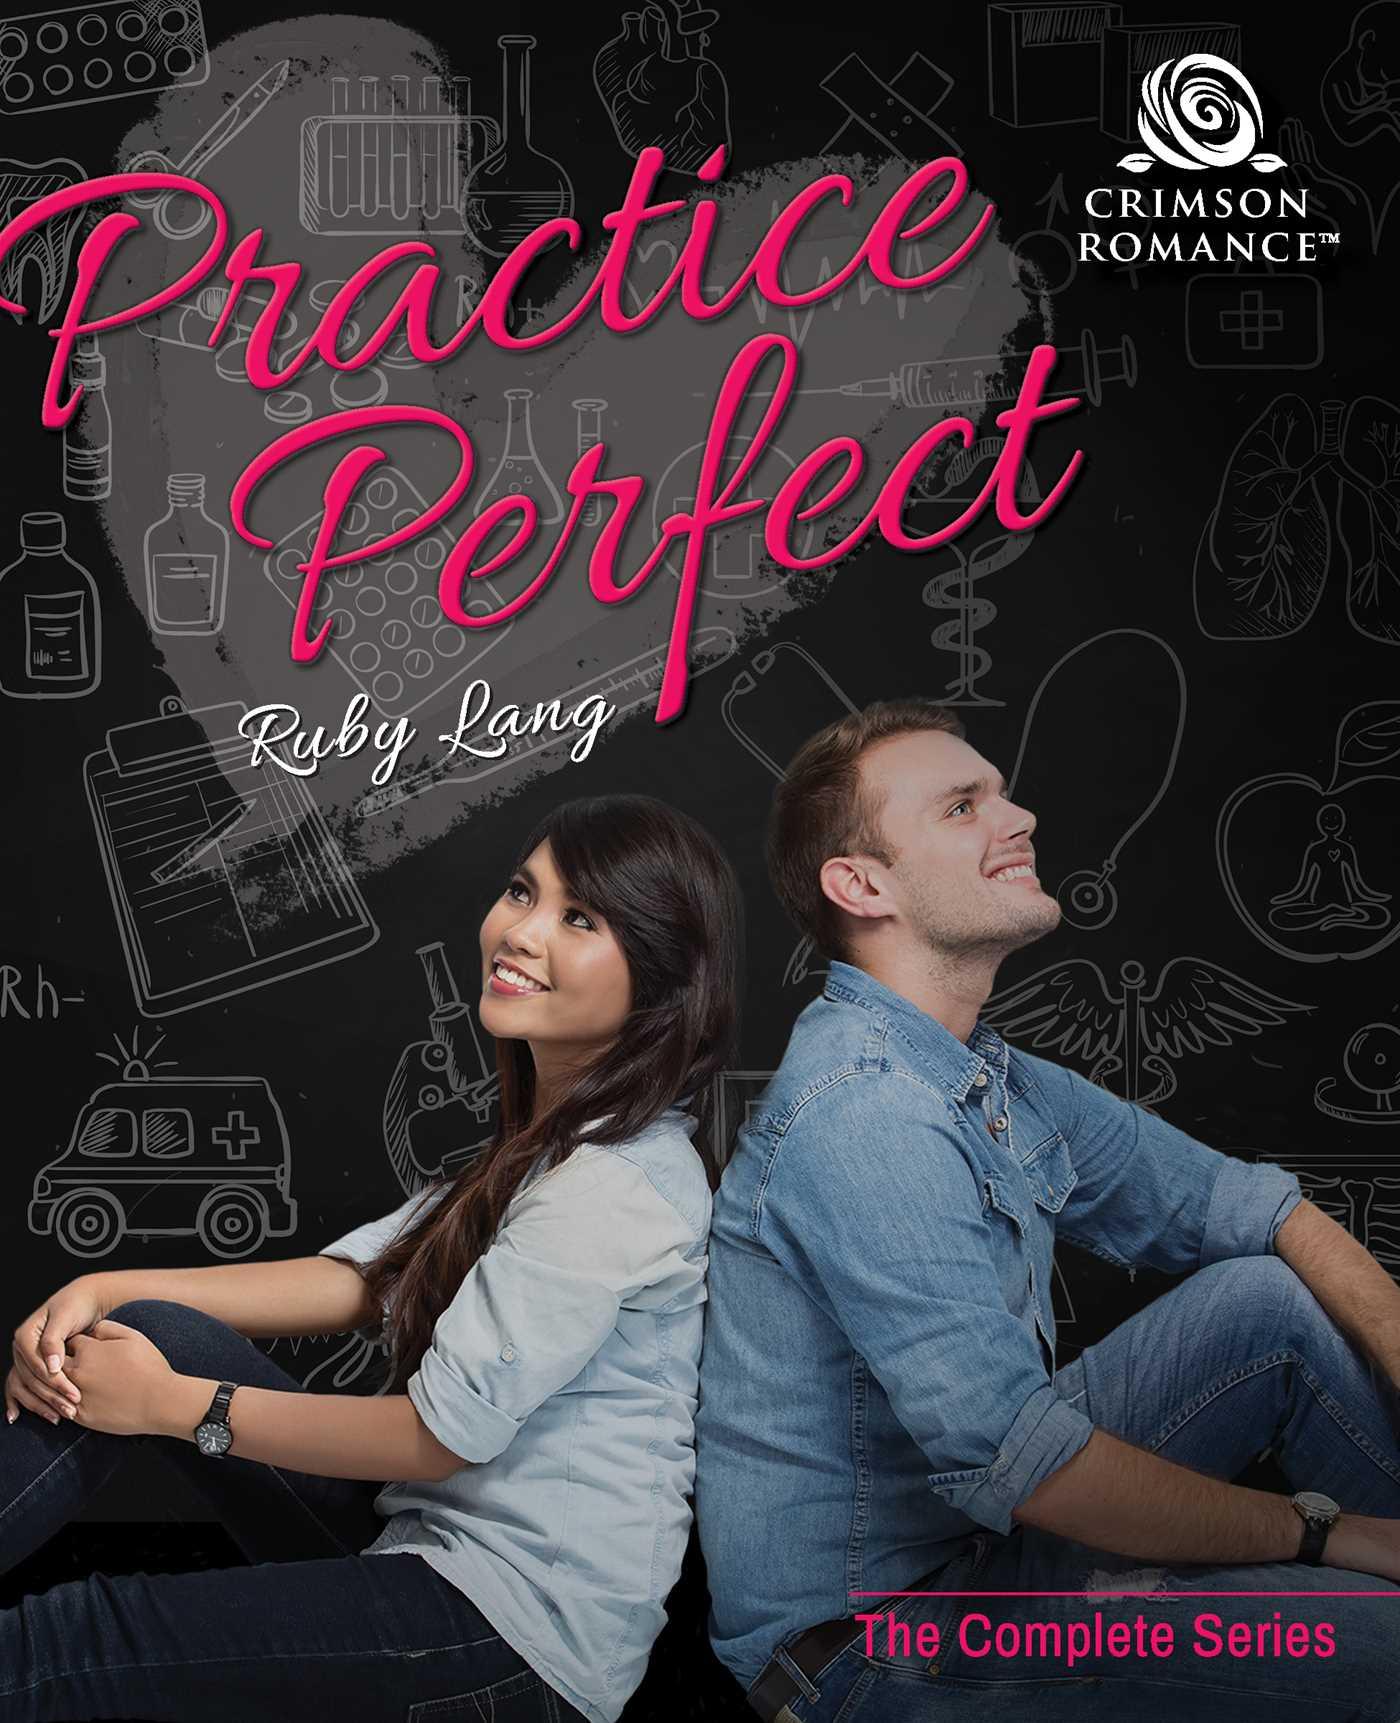 Practice perfect 9781507206058 hr